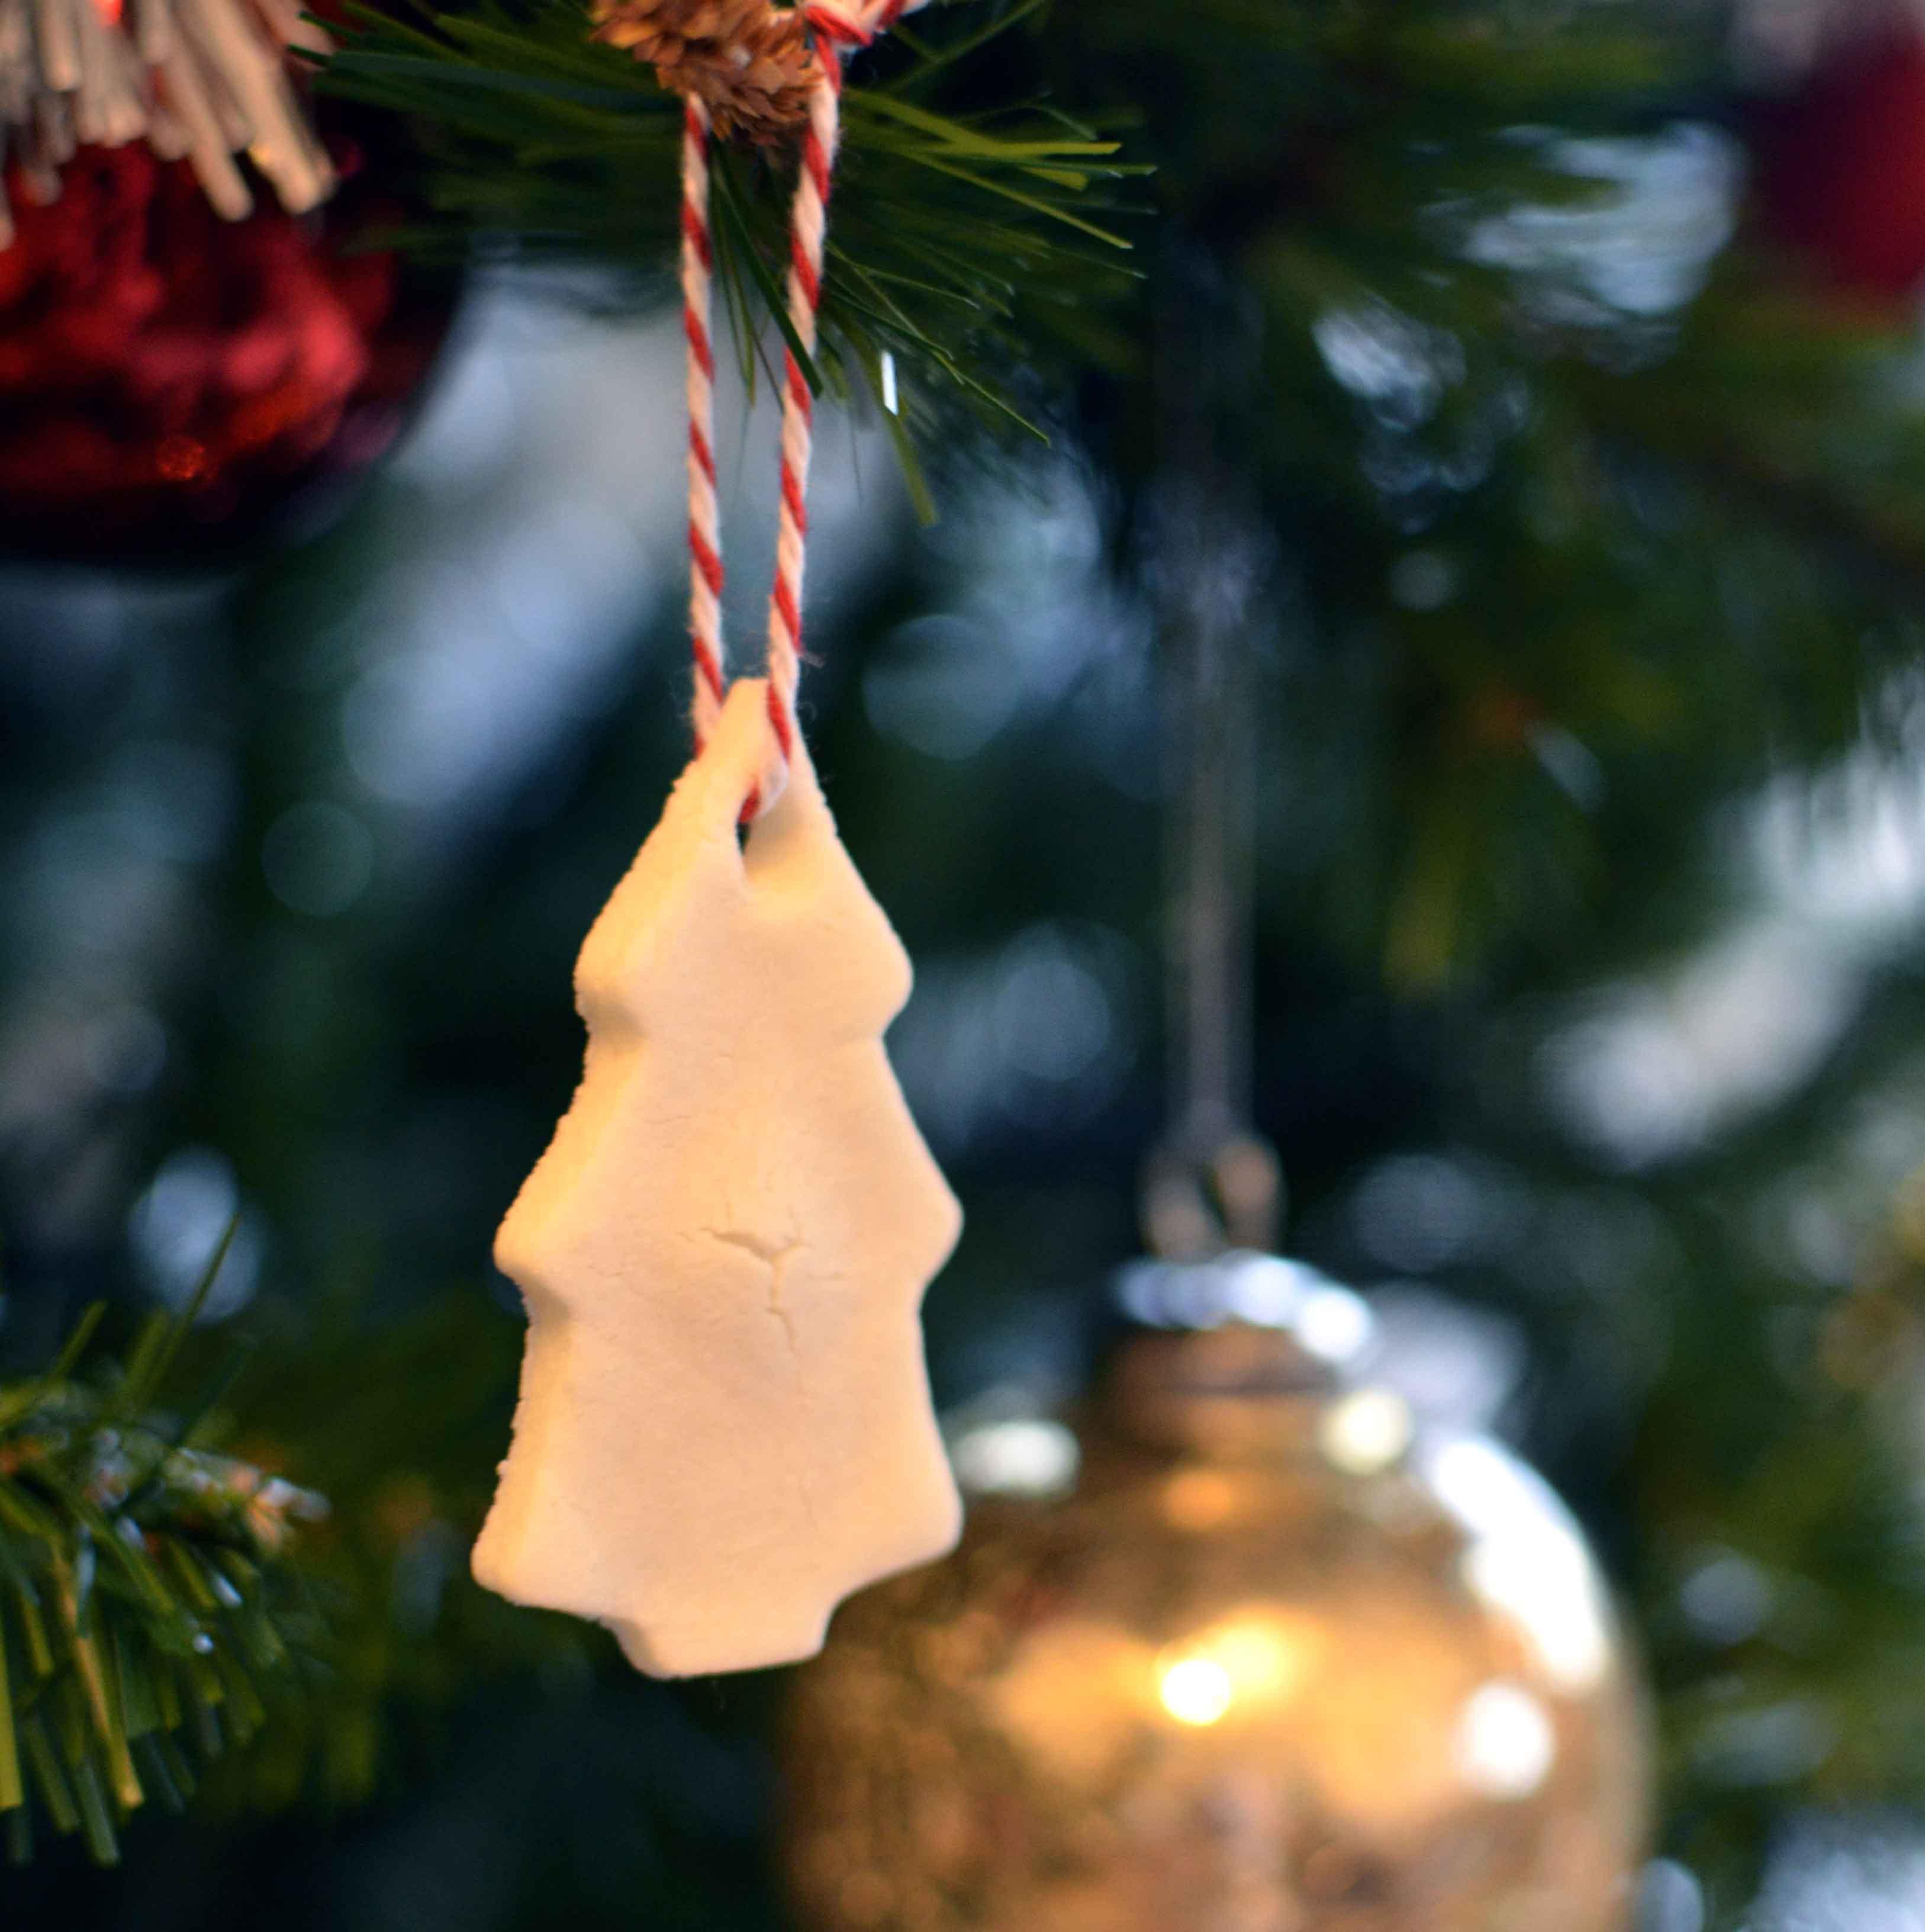 Quand Doit On Mettre Le Sapin De Noel 2017 Noel